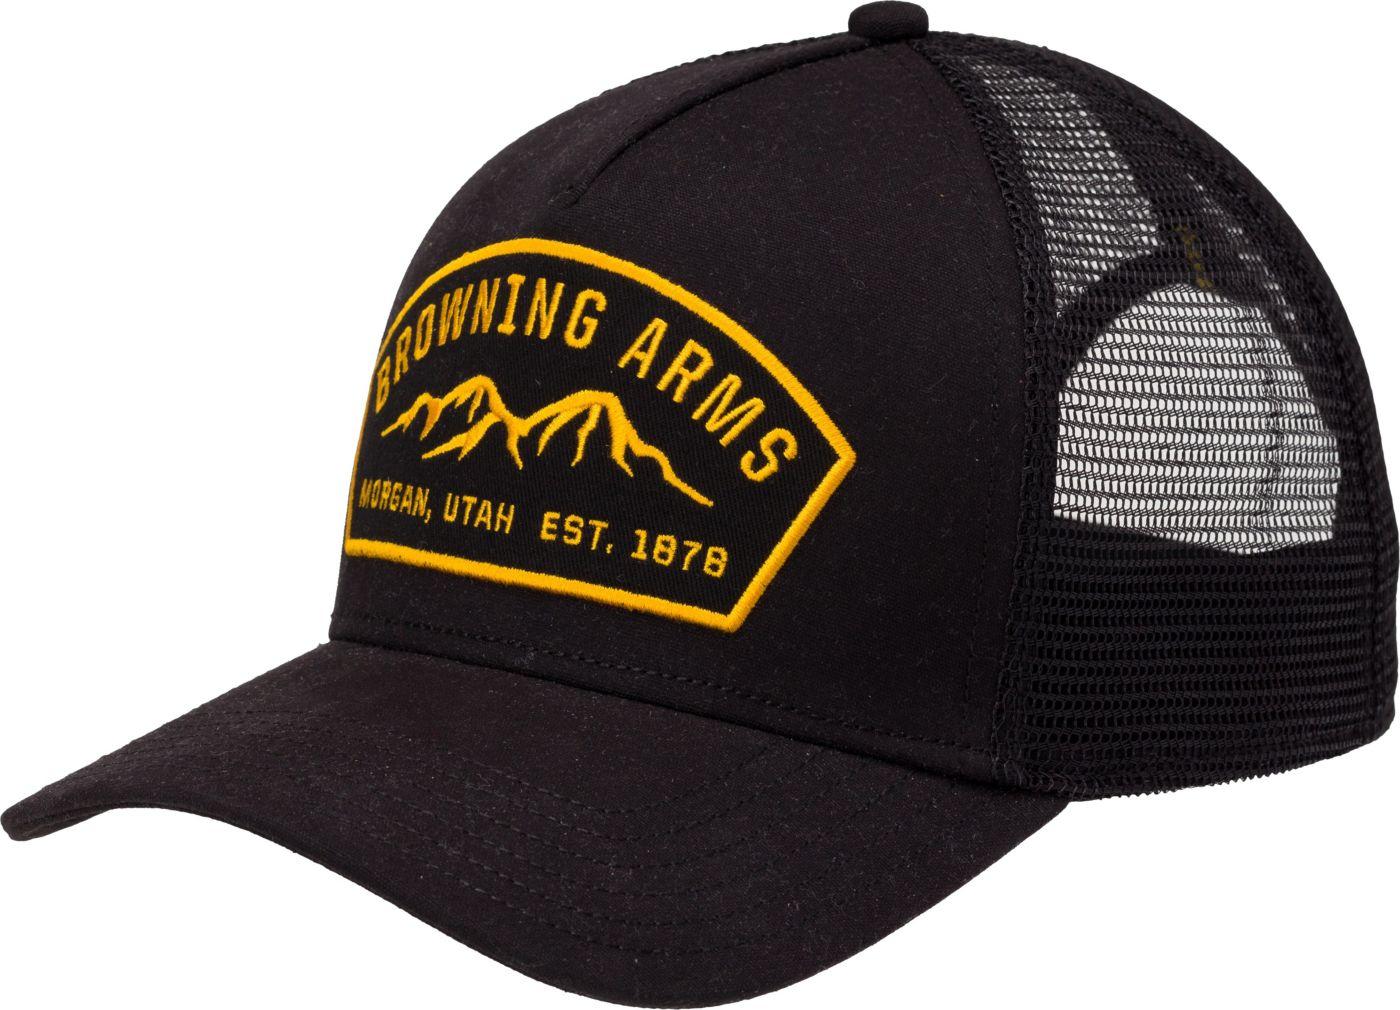 Browning Men's Ranger Loden Hat